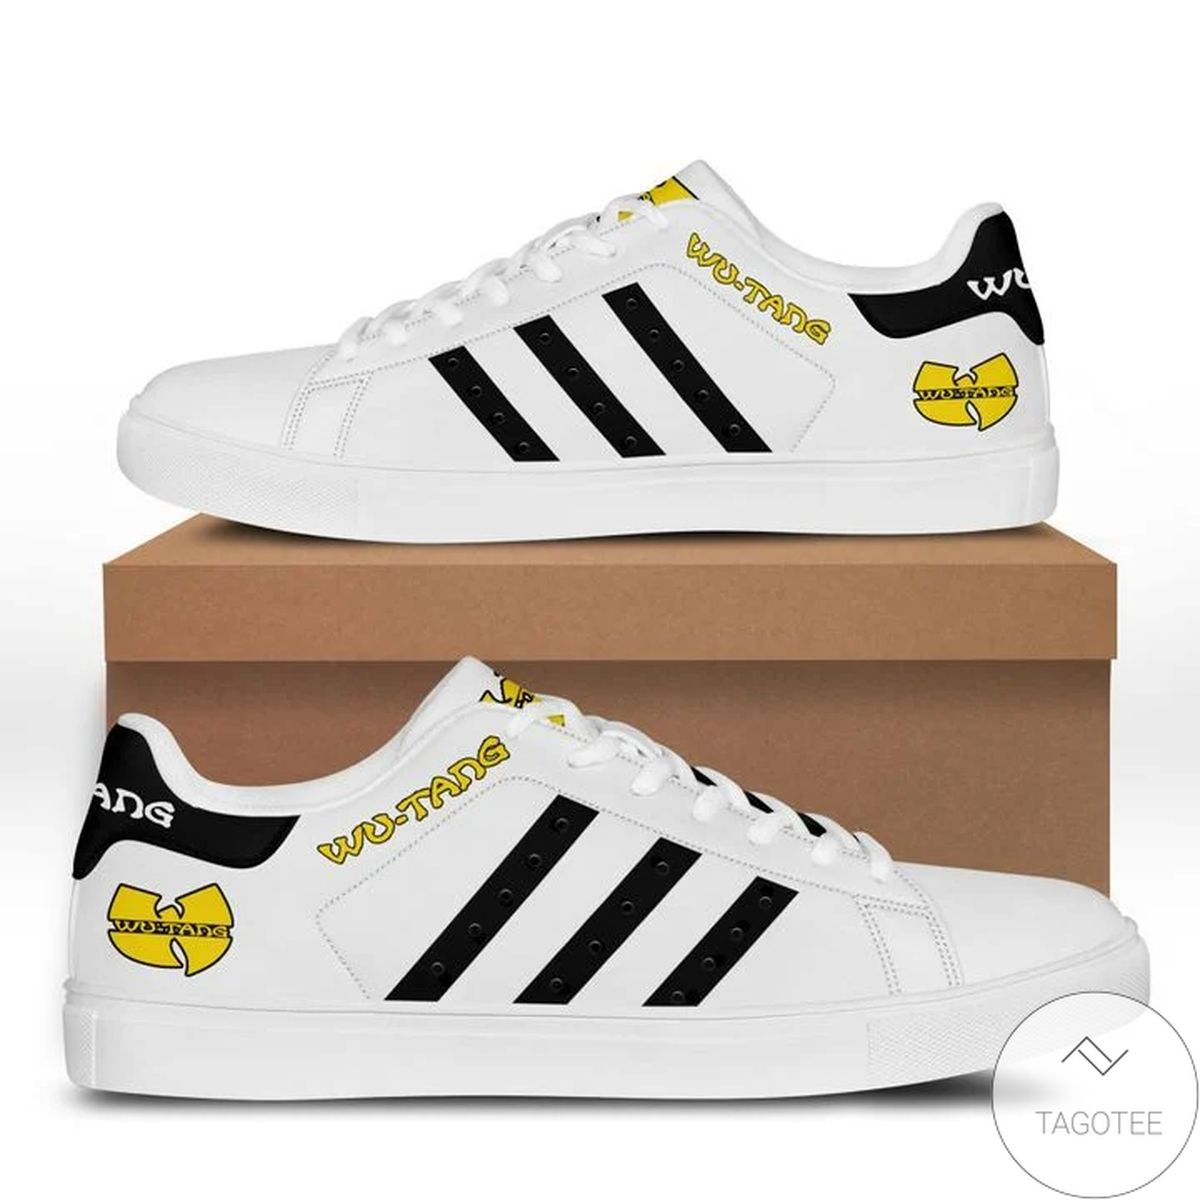 Best Shop Wu-tang Clan Stan Smith Shoes